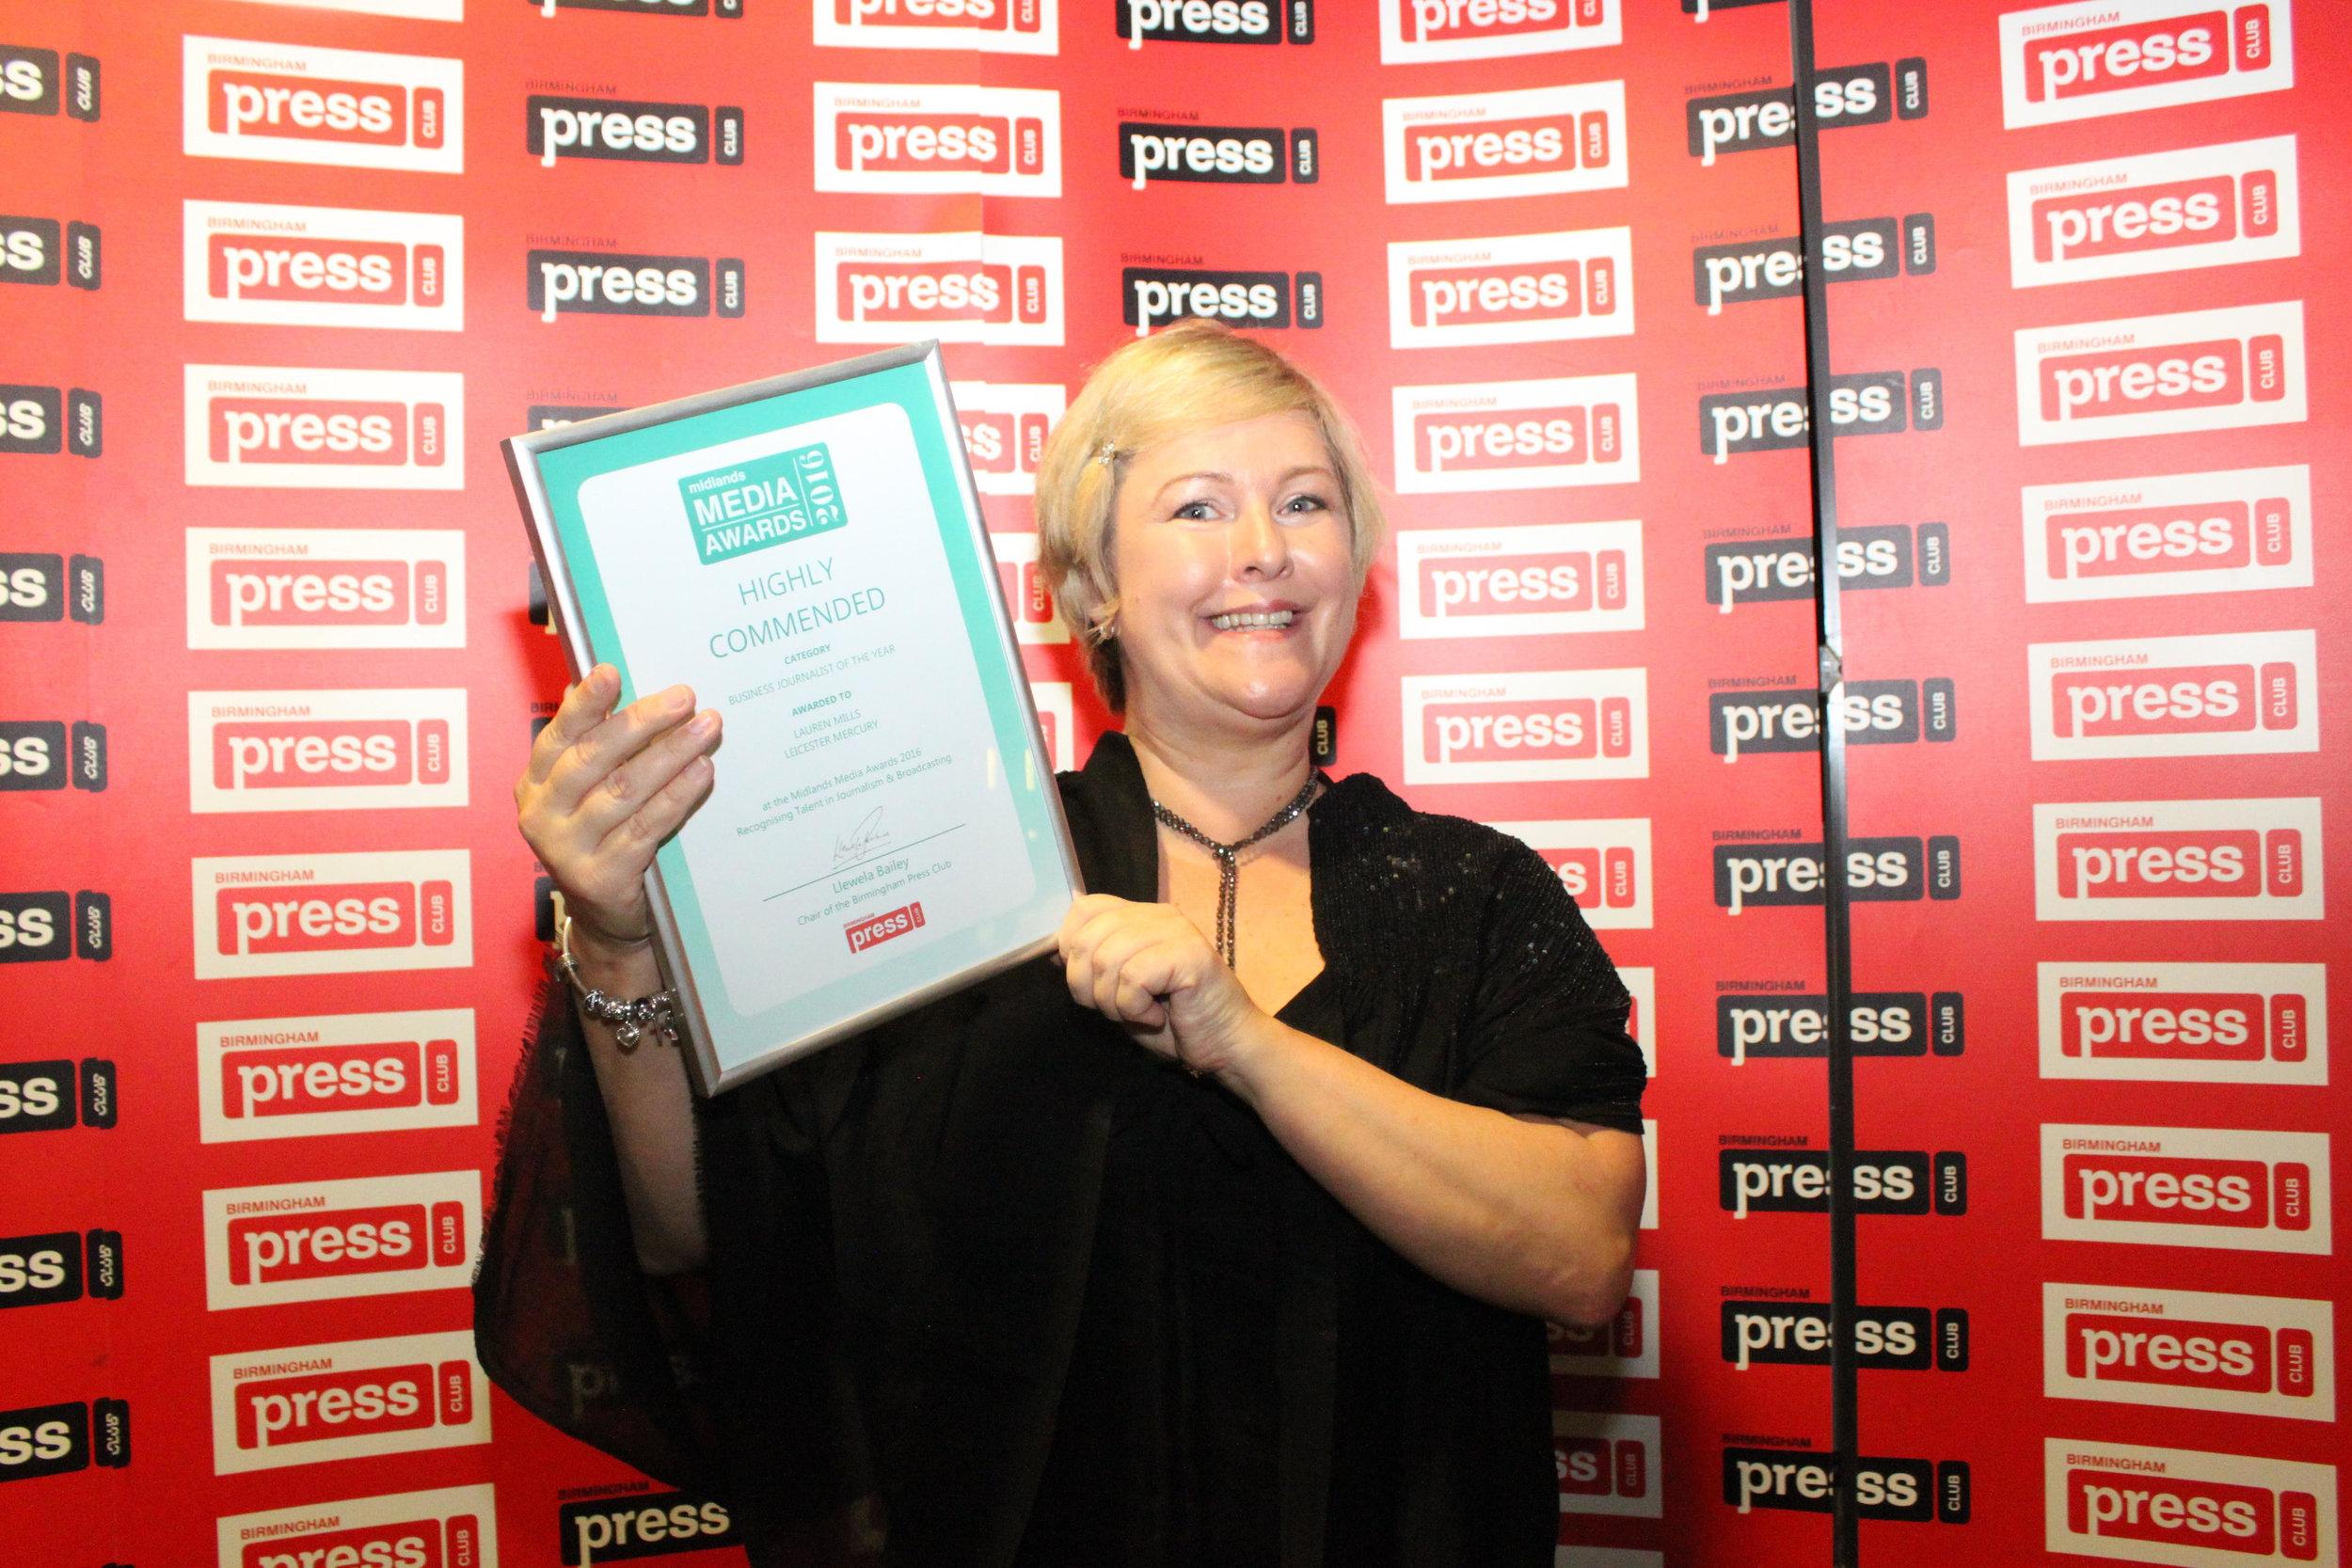 Lauren Mills at the 2016 Midlands Media Awards